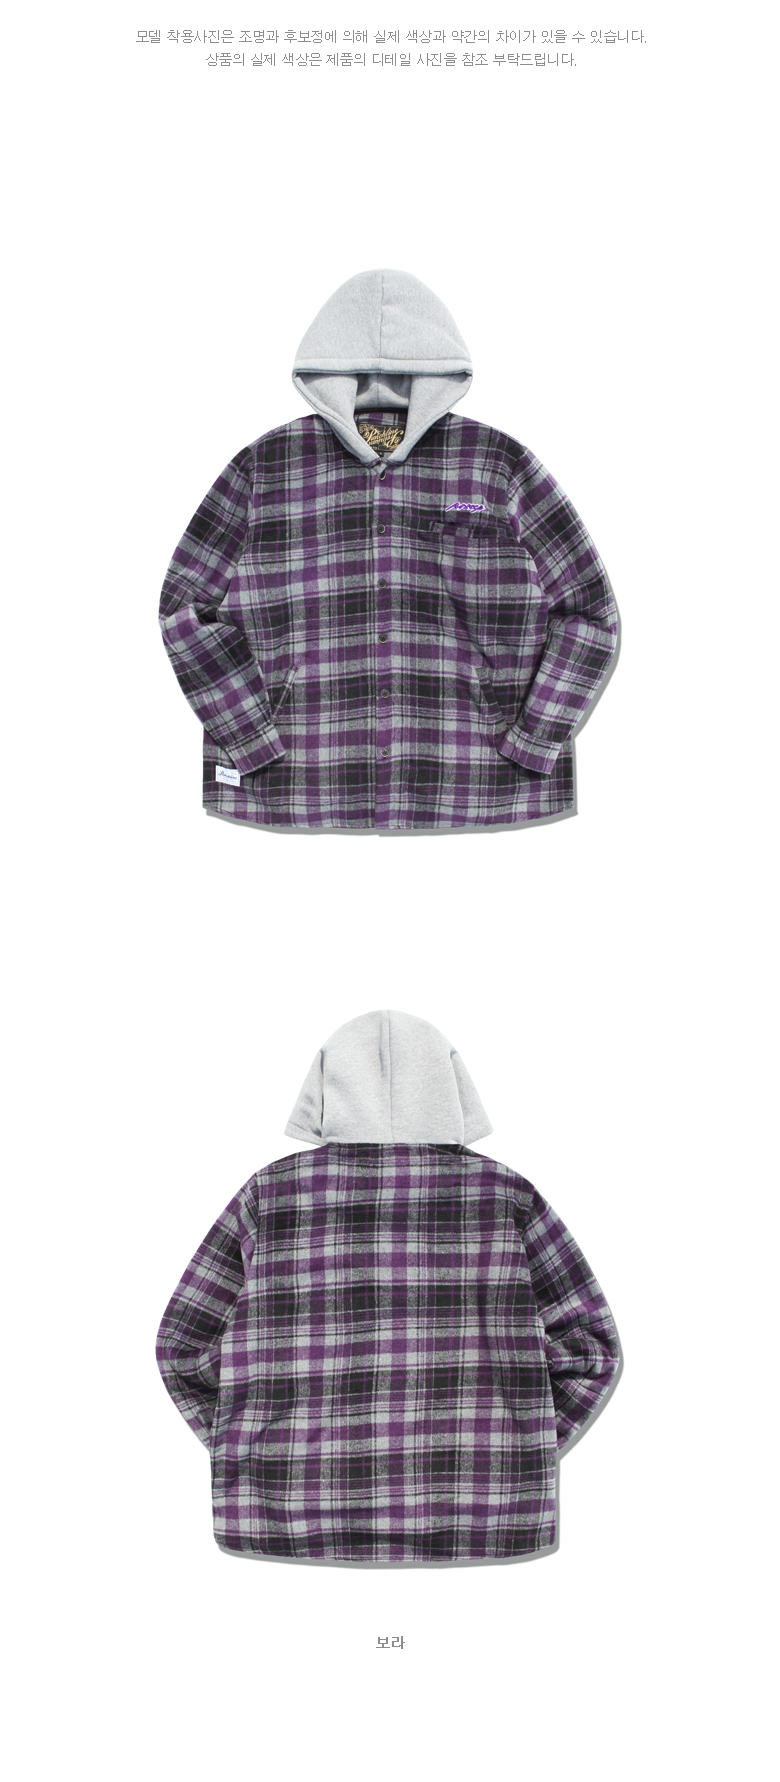 20180905_pl_KHLS6098_detail_purple_01.jpg